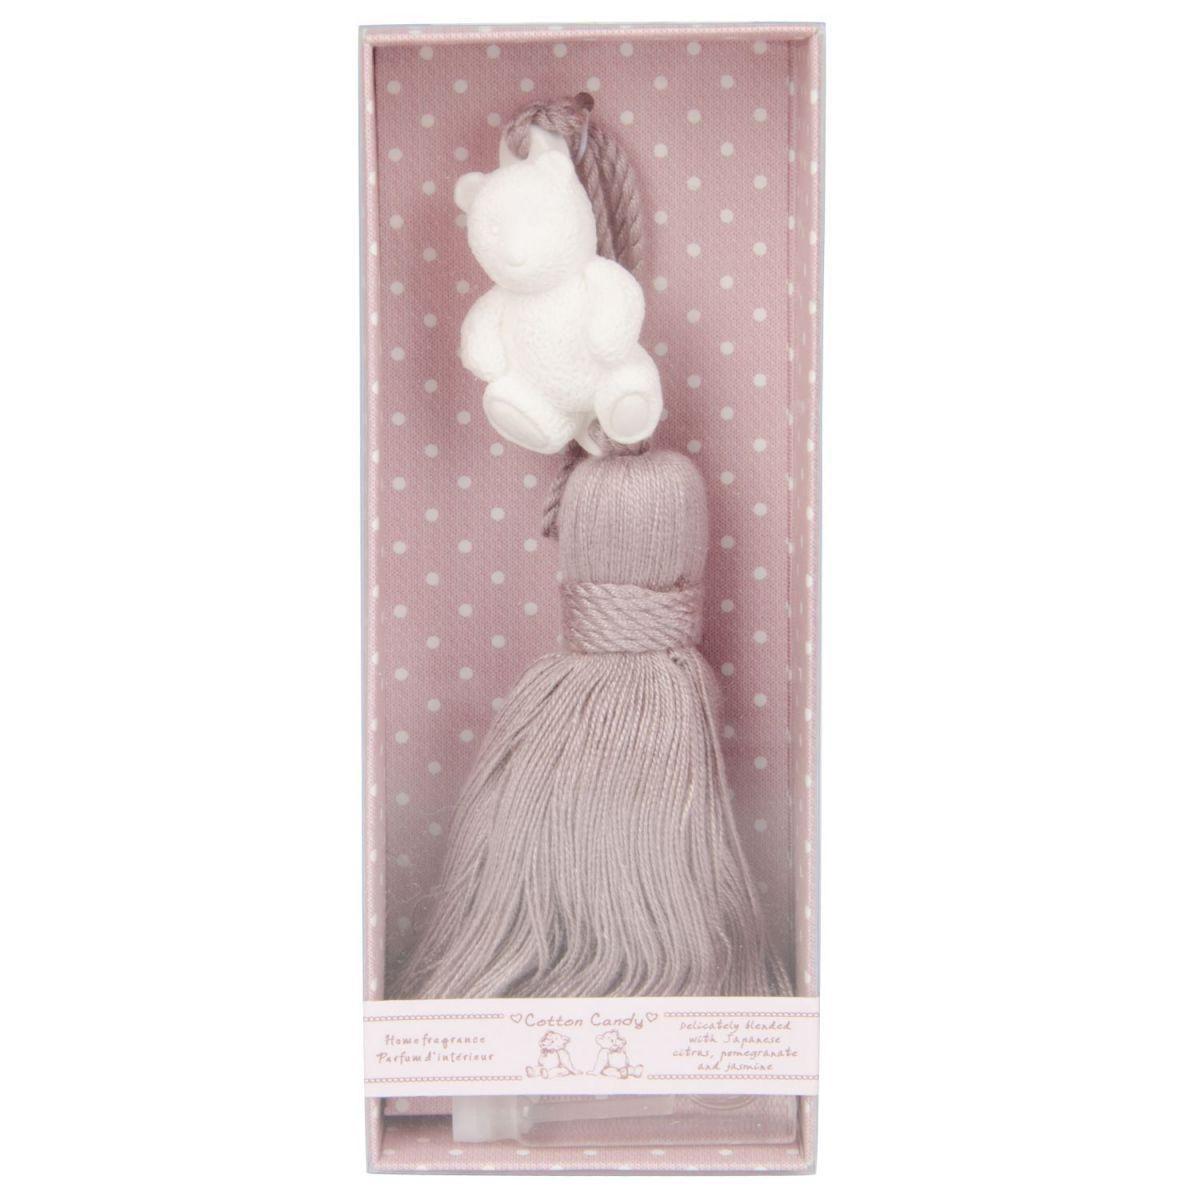 cotton candy ornament m roze kwastjel in geschenkverpakking